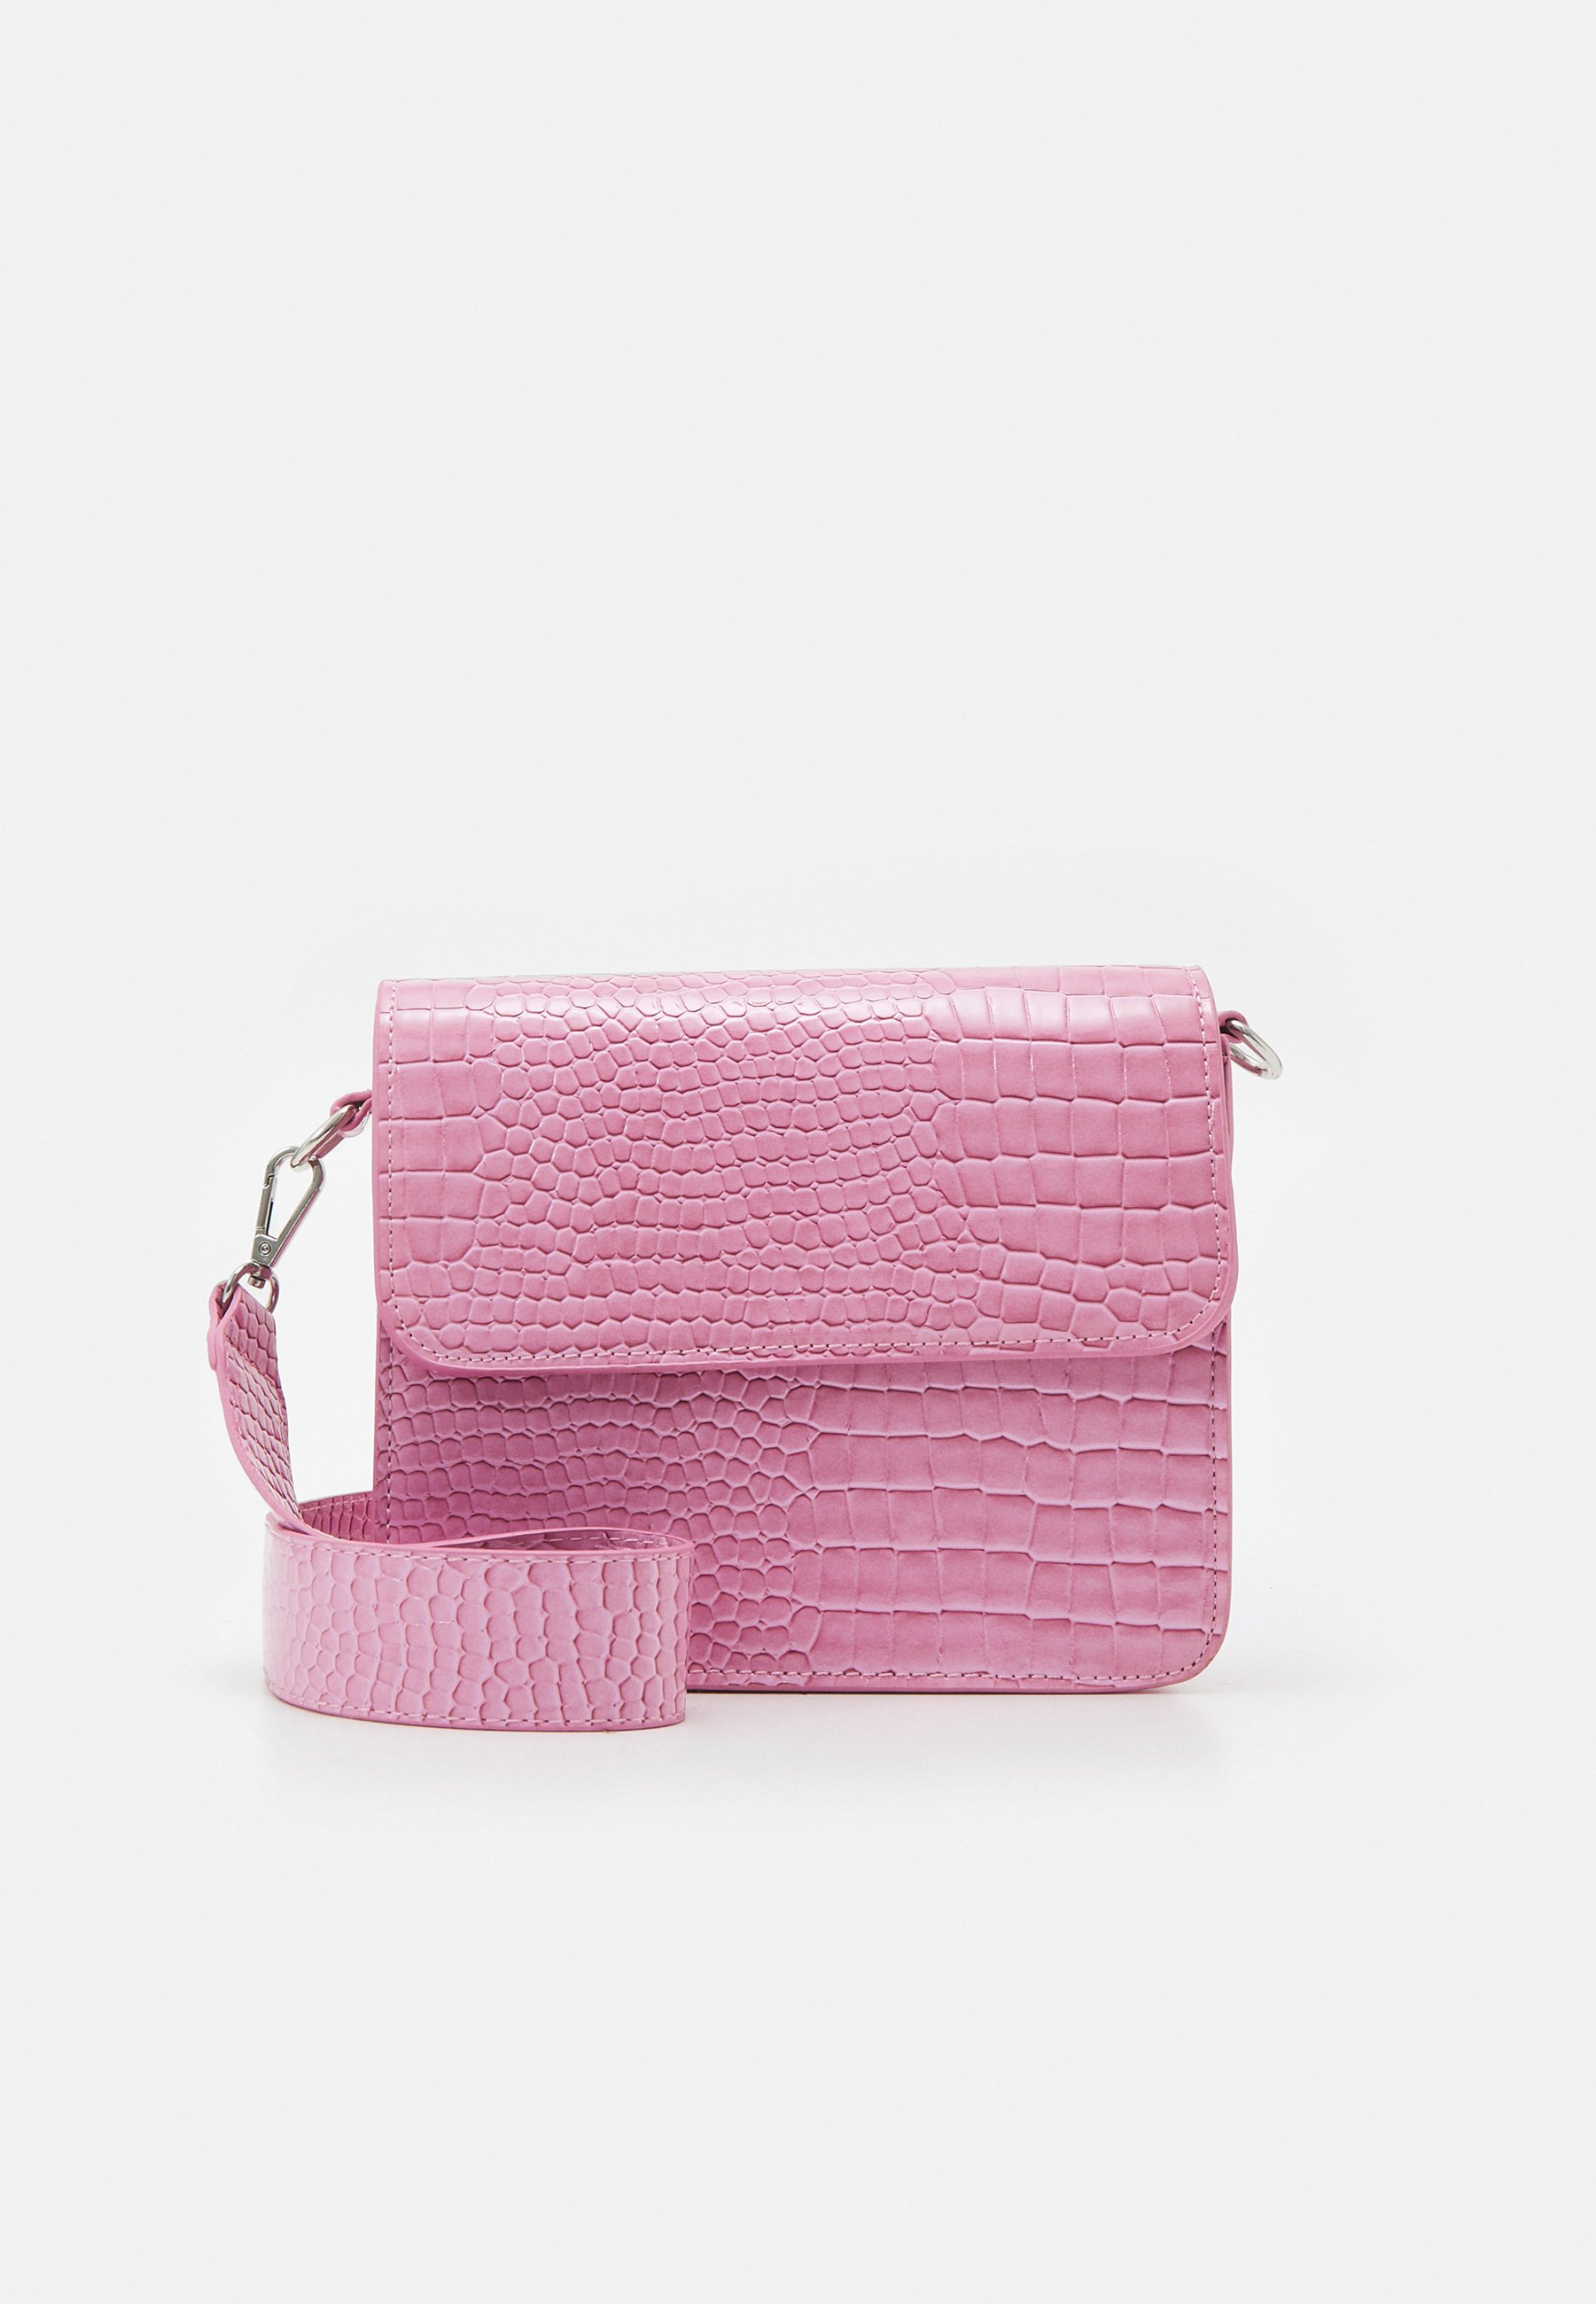 Damen CAYMAN SHINY STRAP BAG - Umhängetasche